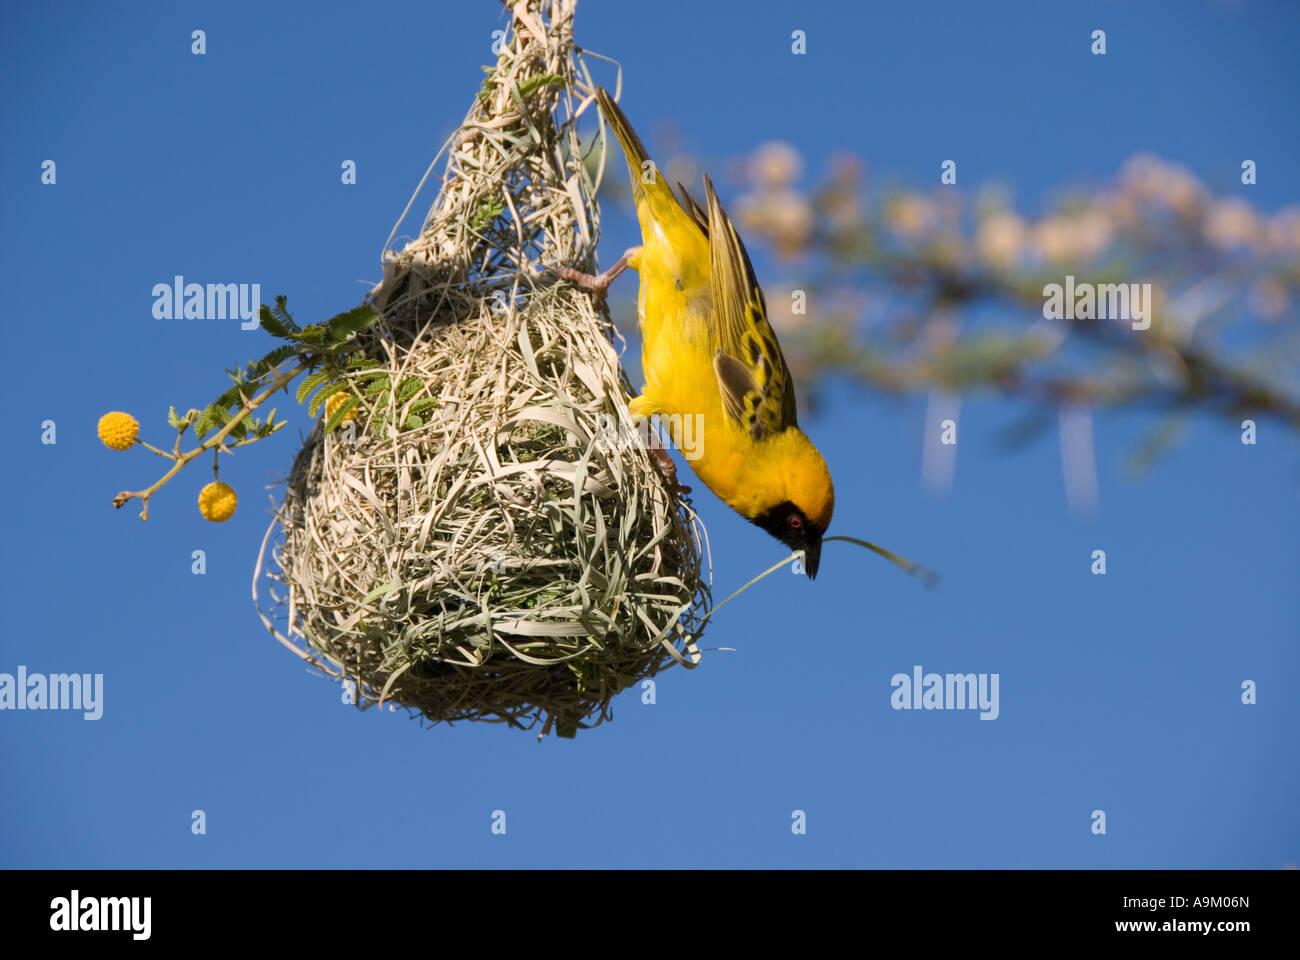 Weaver weaving (2) -- masked weaver building nest, in Namibia - Stock Image